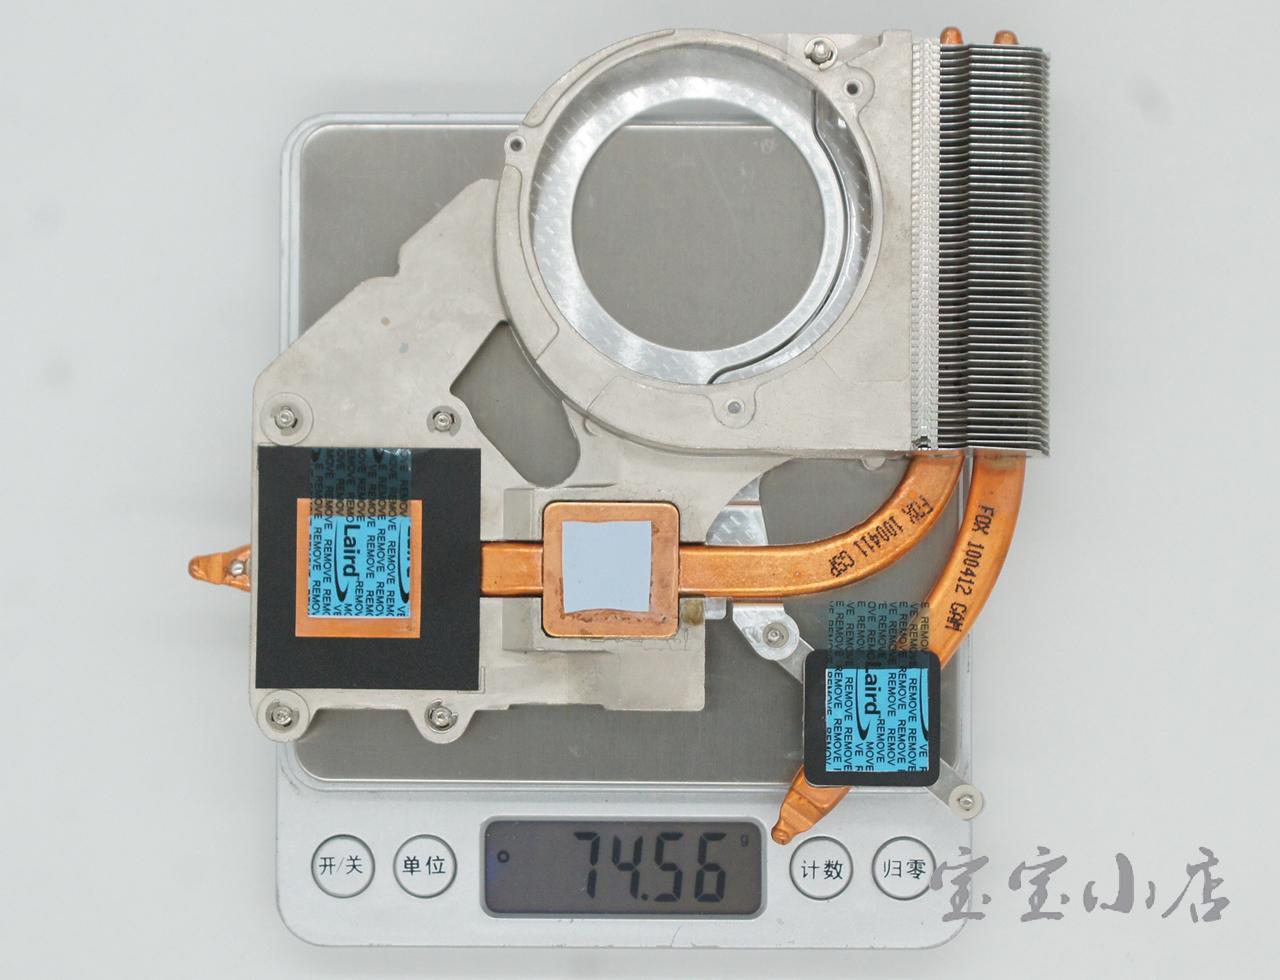 102pcs 惠普HP ProBook 4515S 4415 4416S CPU Cooling Module Heatsink 6043B0063901 535805-001 散热器 导热管 铜管